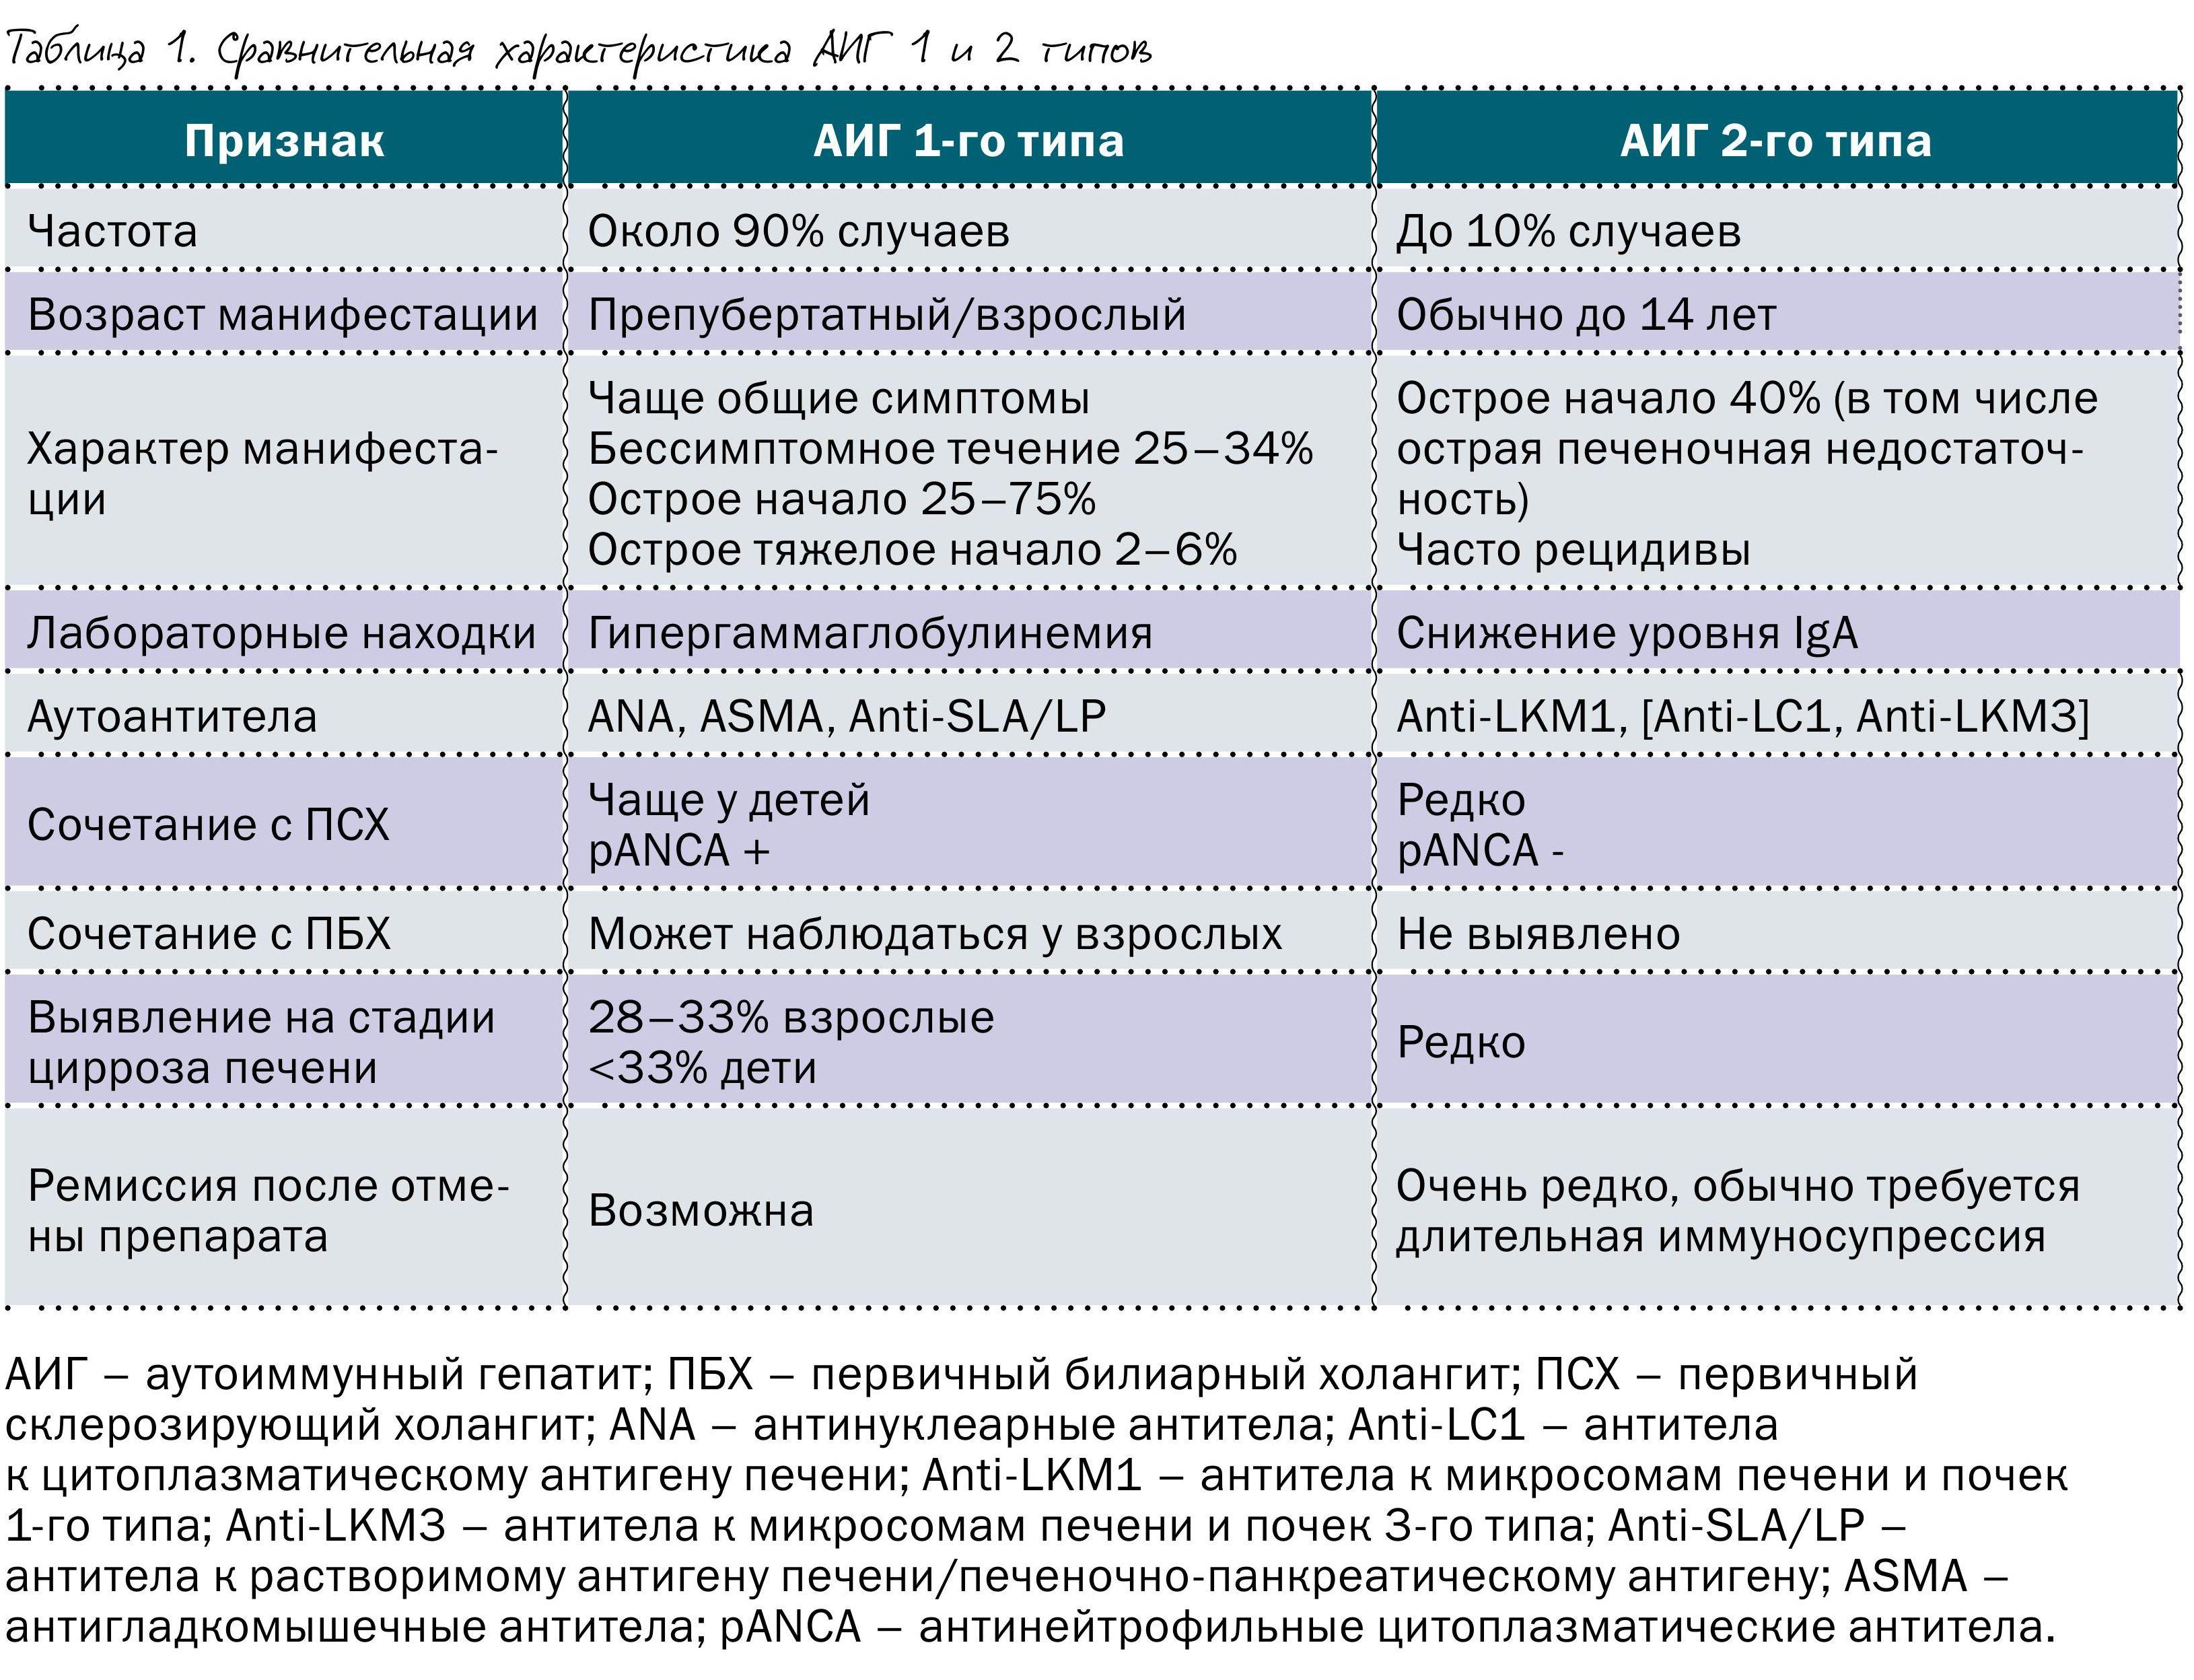 3 типа аутоимунного гепатита